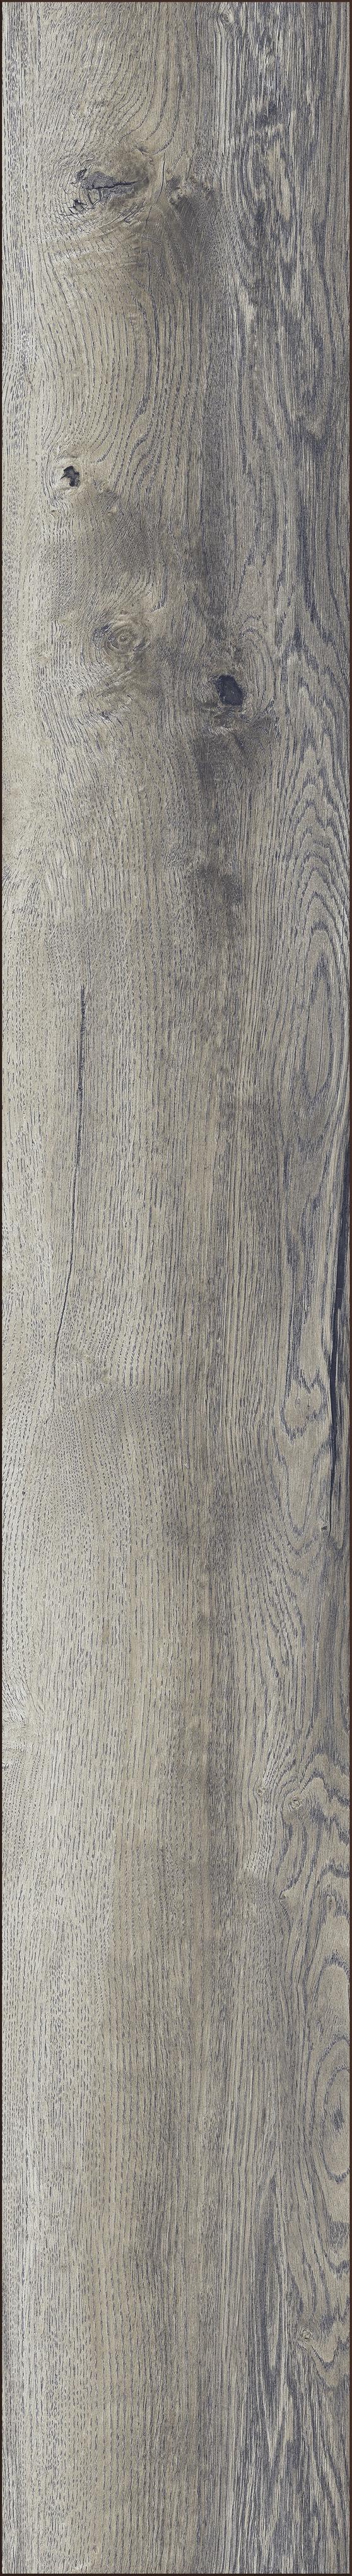 kronotex robusto laminat harbour oak grey d 3572 von. Black Bedroom Furniture Sets. Home Design Ideas